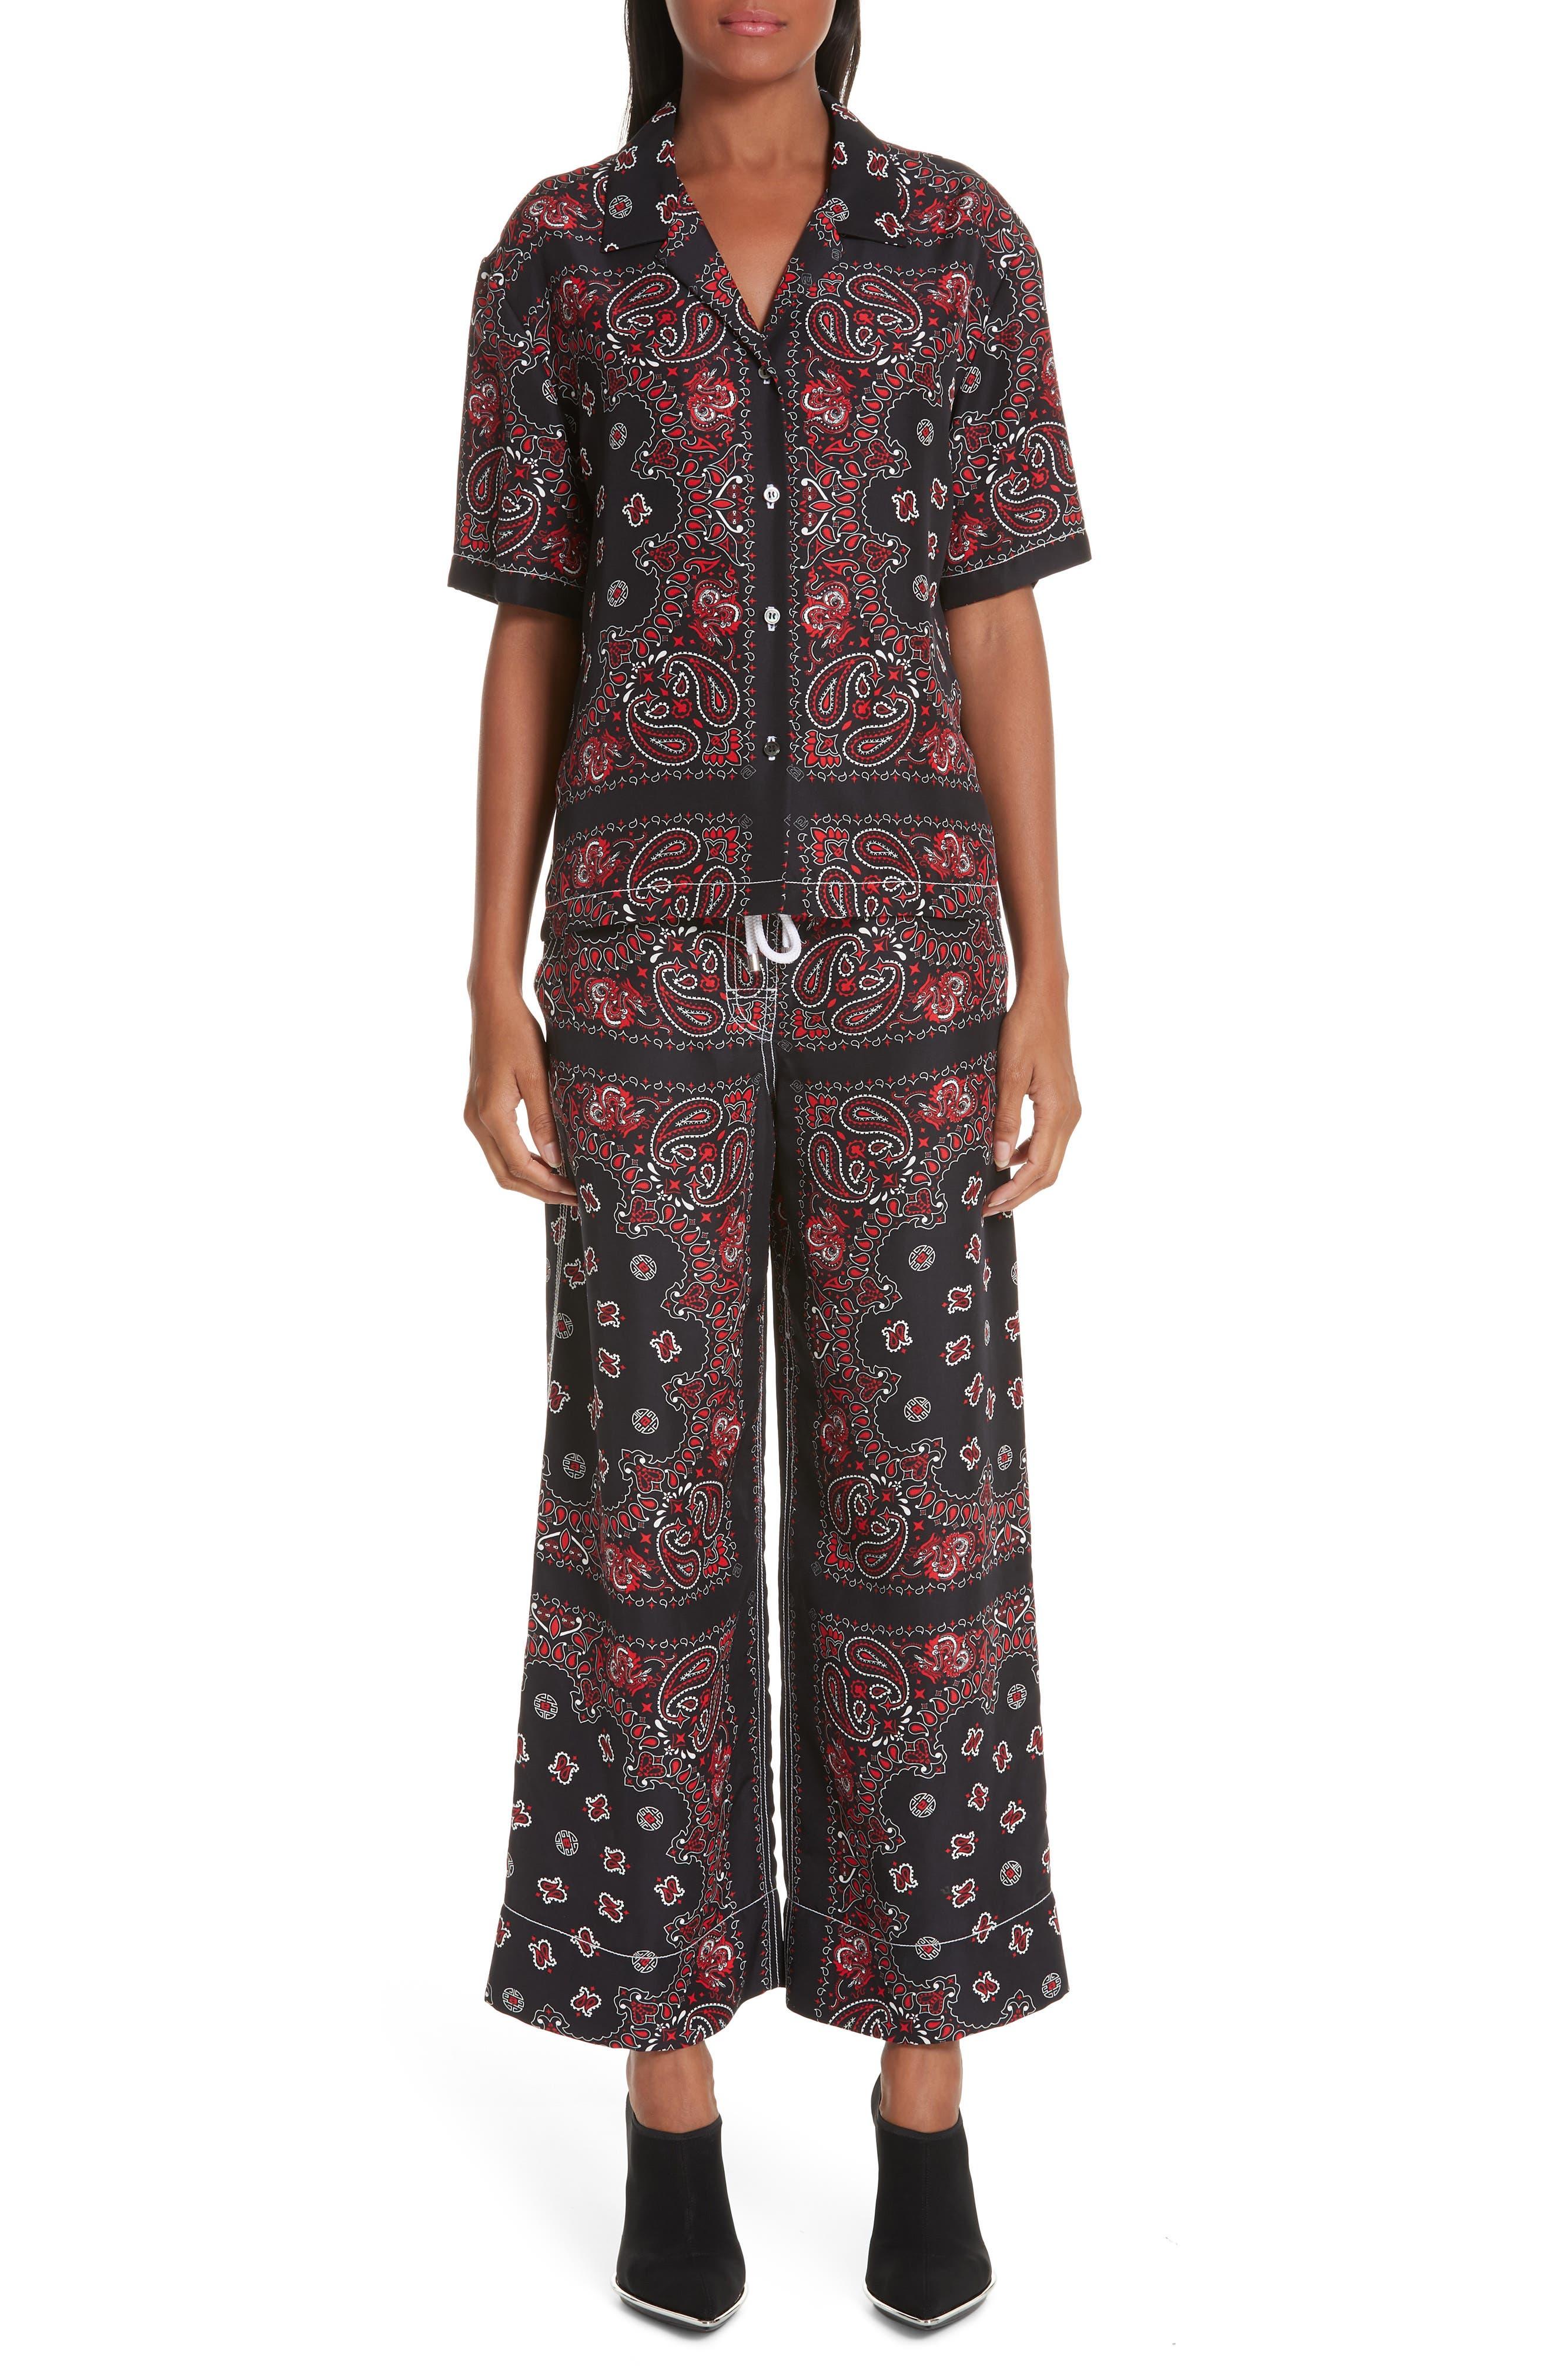 ALEXANDER WANG,                             Bandana Print Silk Shirt,                             Alternate thumbnail 8, color,                             BLACK/ RED